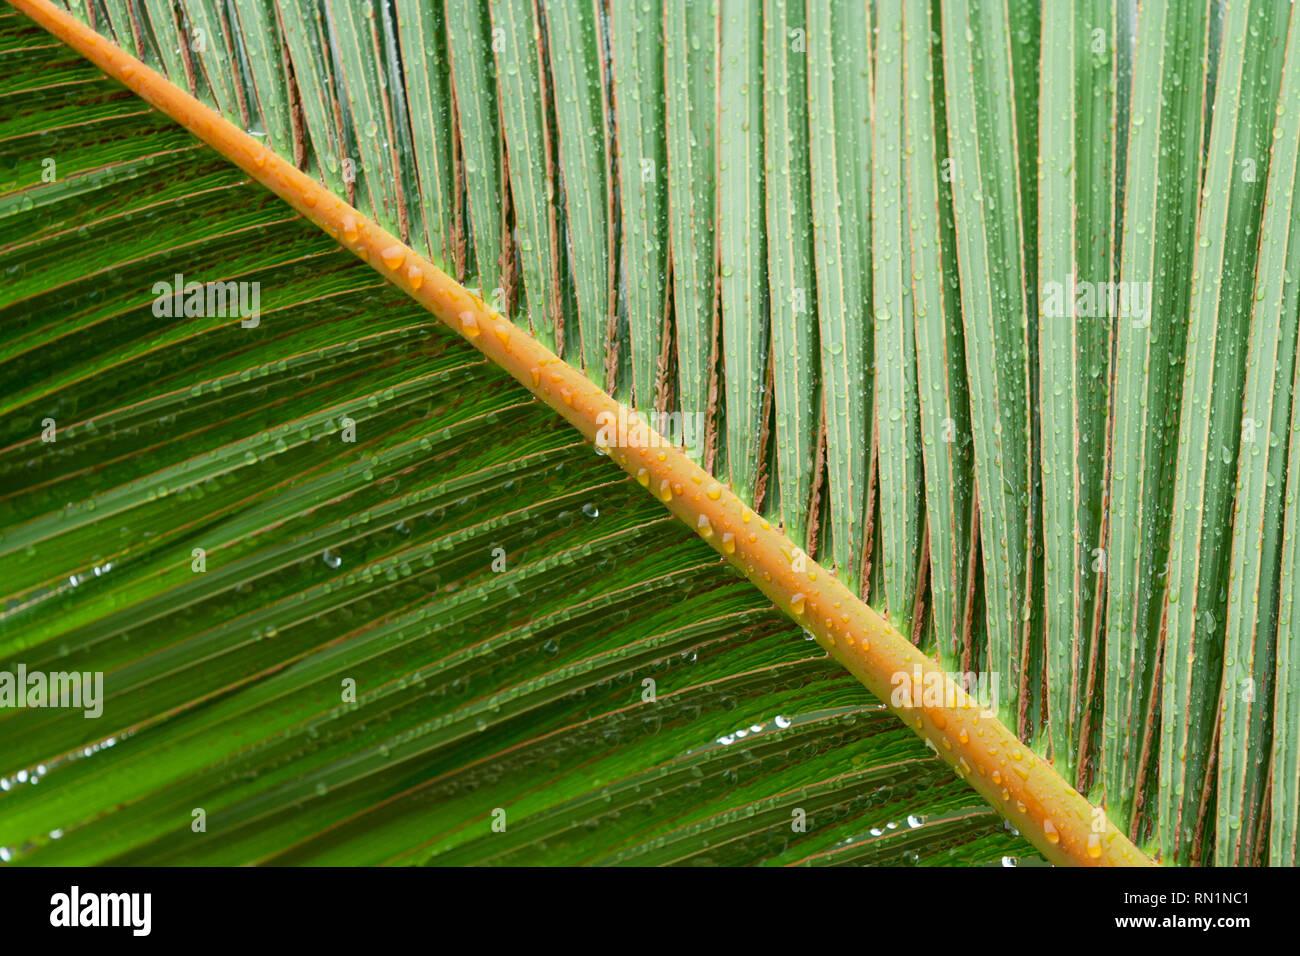 Dwarf palm tree (Hyophorbe vaughanii) green leaf, aka 'palma', bottle palm 'palmera botella', Mascarena, rainy day, Asuncion, Paraguay - Stock Image